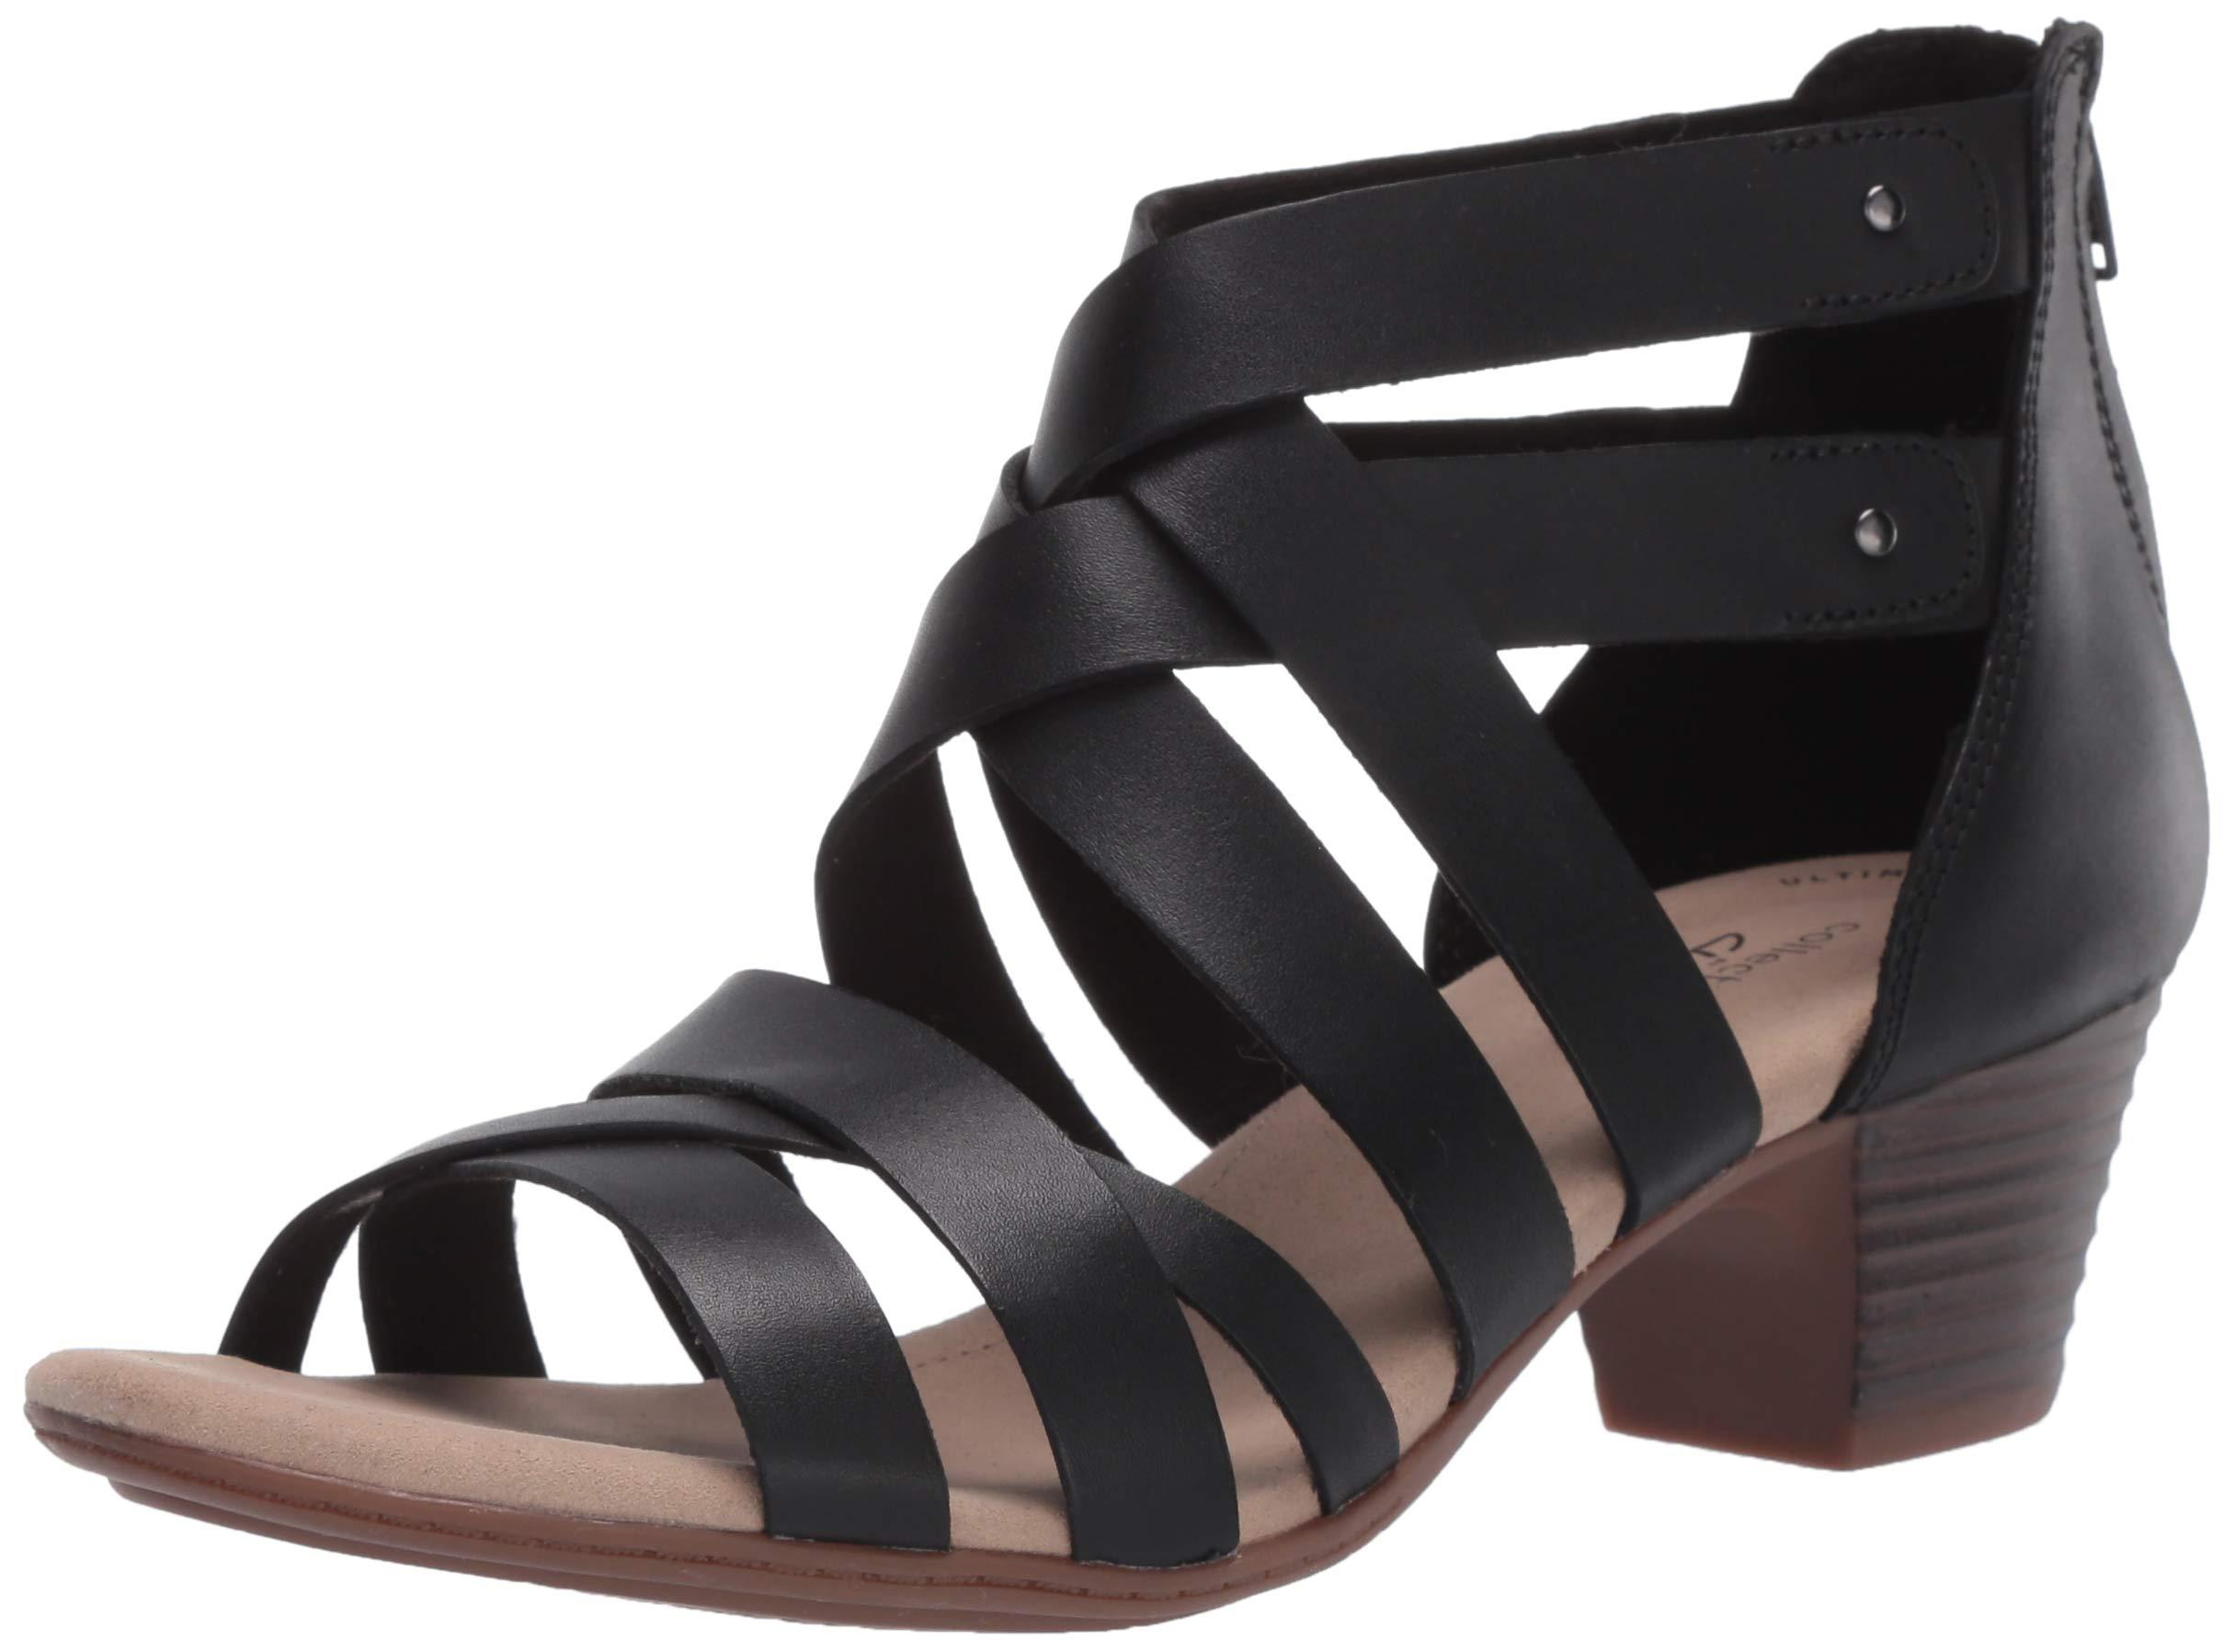 Details about  /Clarks Women/'s Valarie Dream Heeled Sandal Choose SZ//color